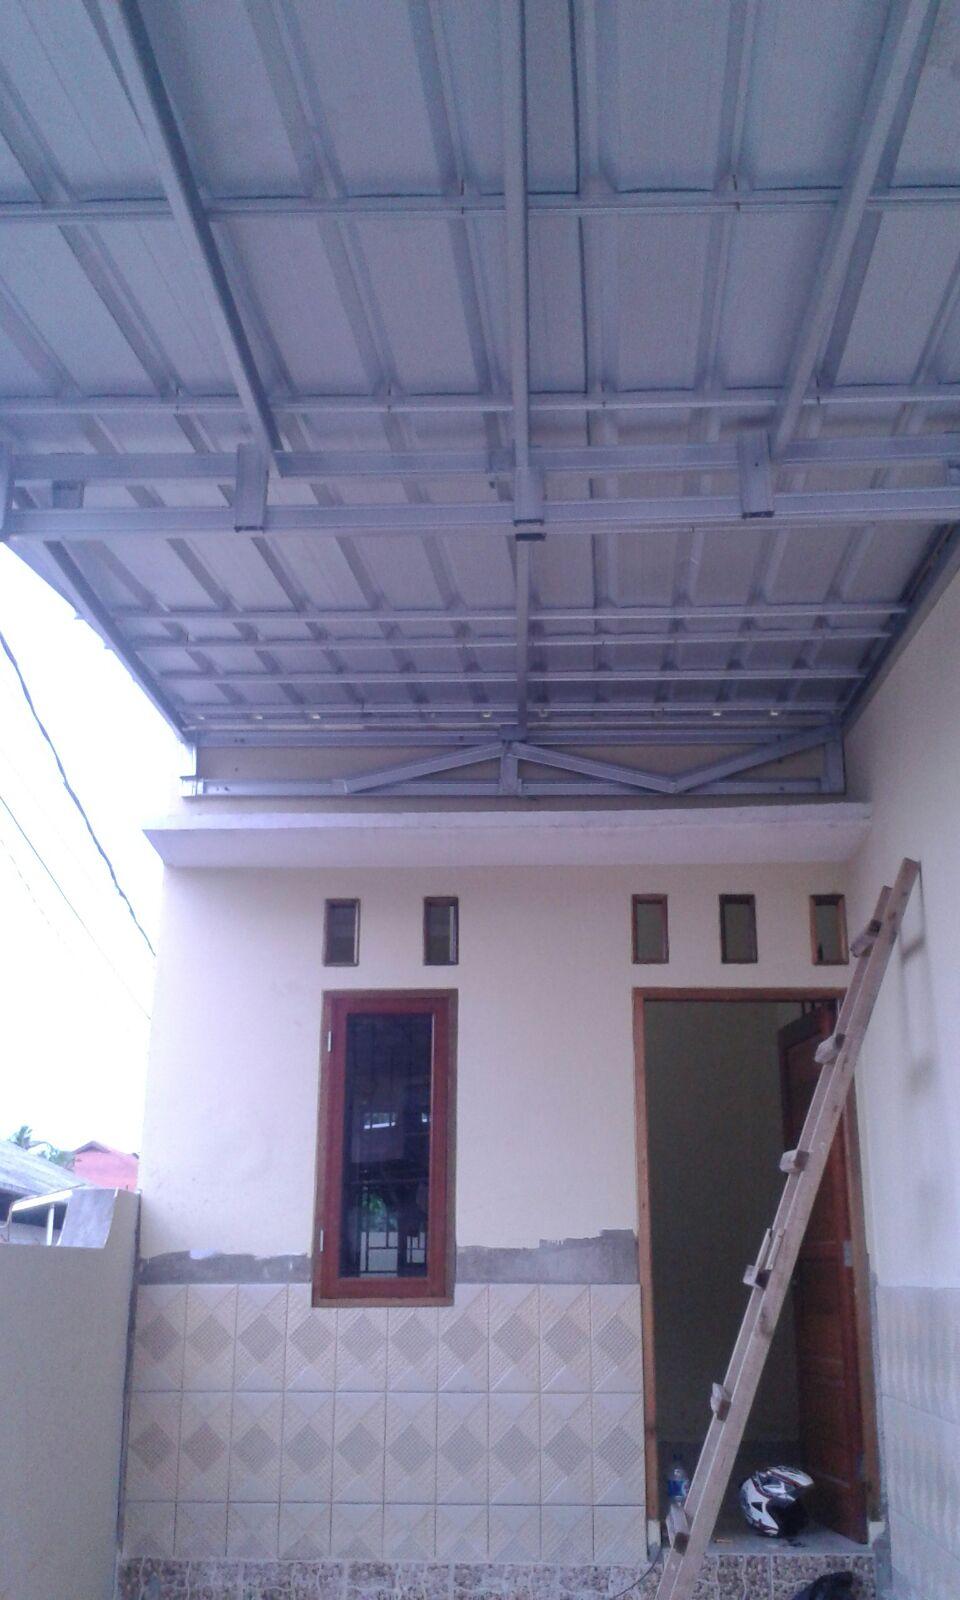 Atap Baja Ringan Ciledug Pasang Bahan Bangunan 081249846372 Harga Per